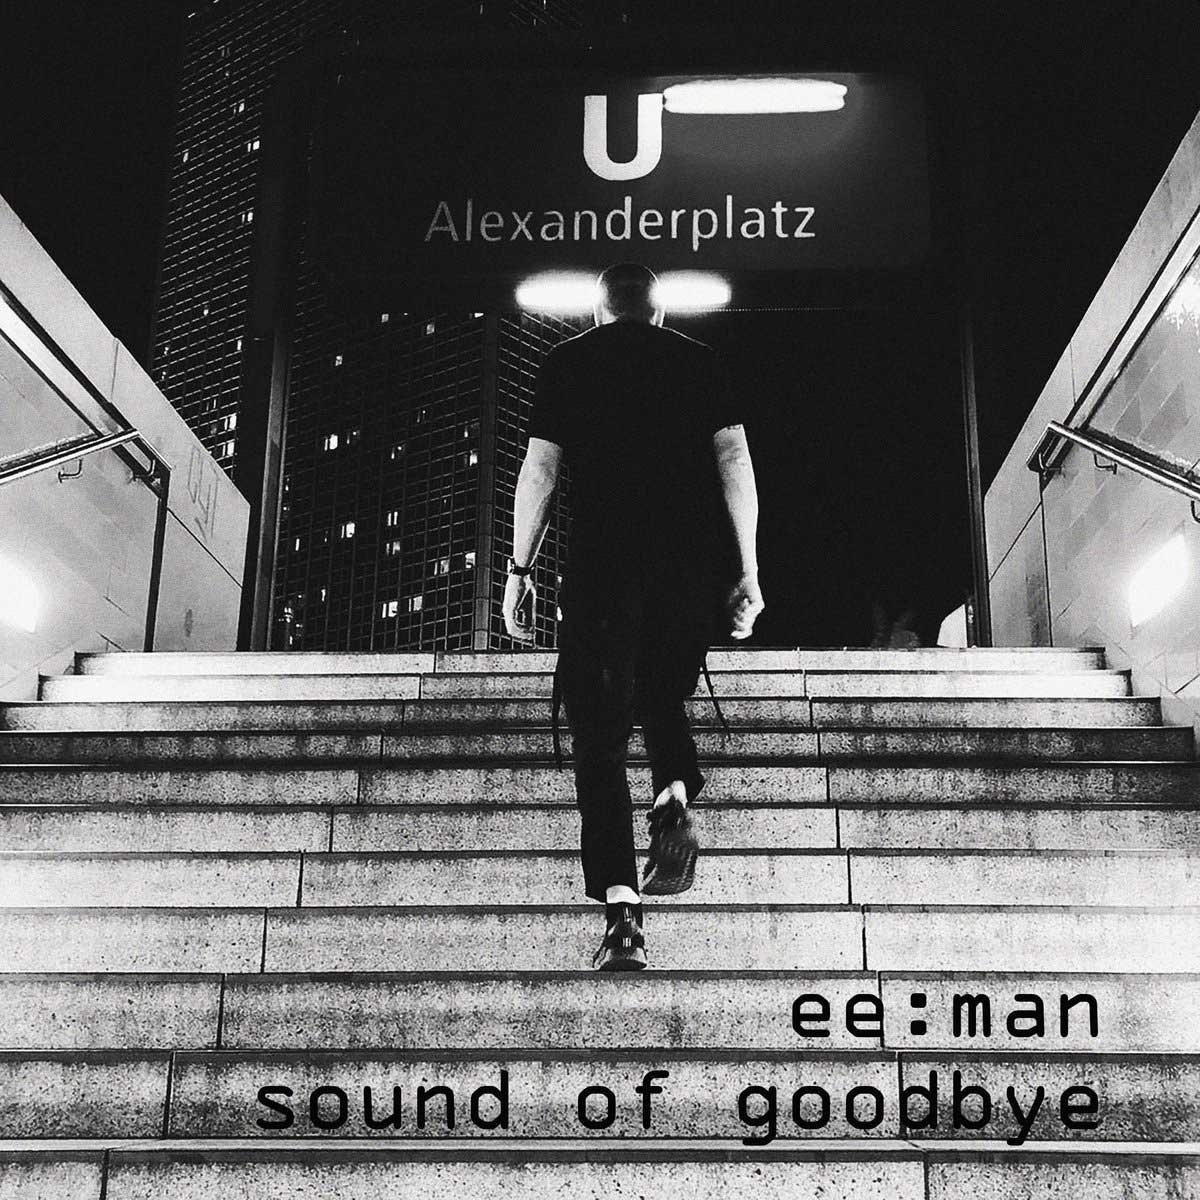 ee:man - Sound of Goodbye - ee:man - Sound of Goodbye